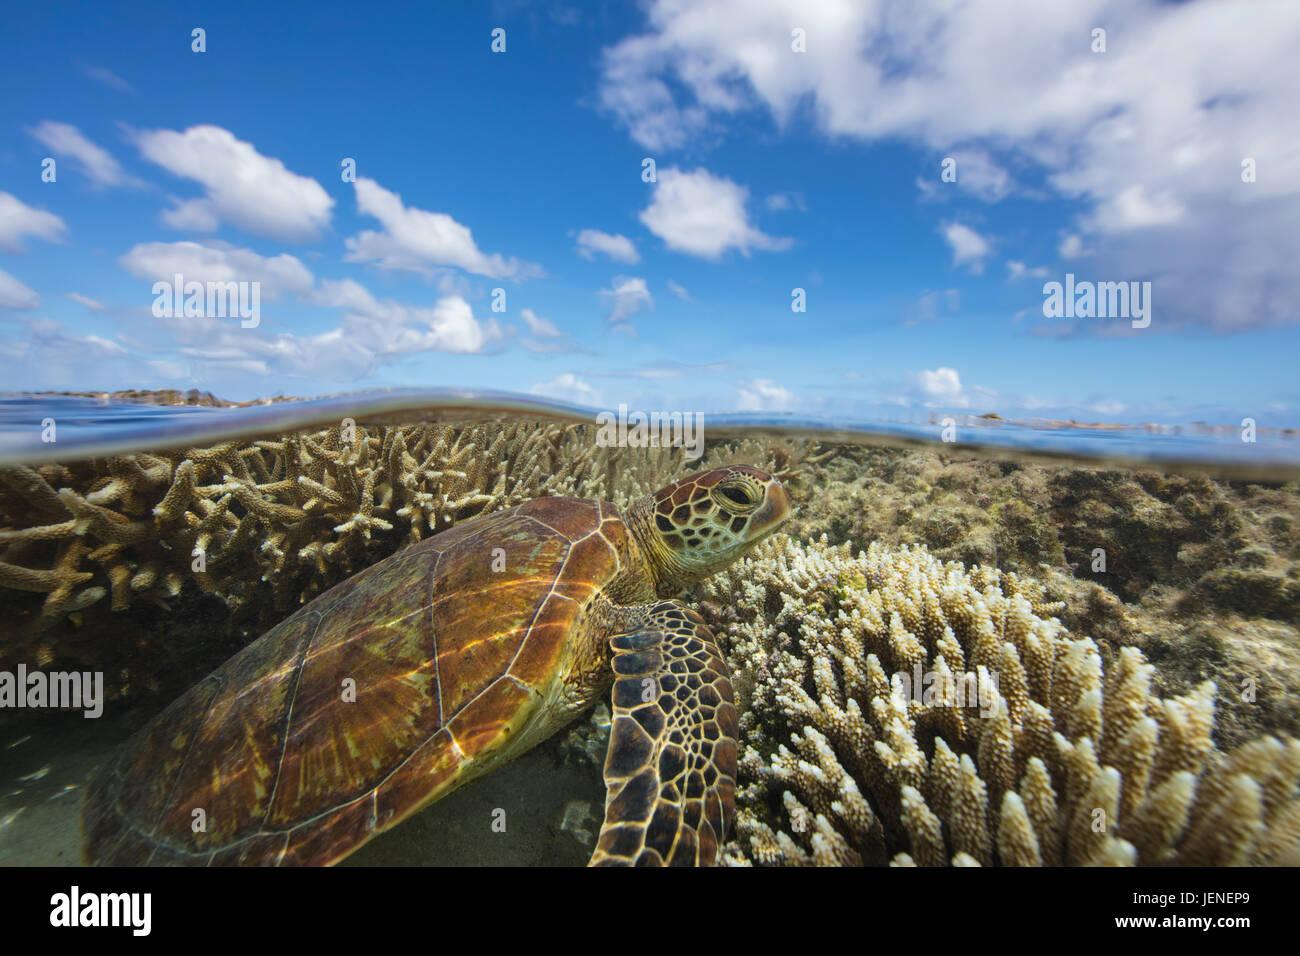 Piscina de tortugas verdes a lo largo de un arrecife de for Piscina para tortugas